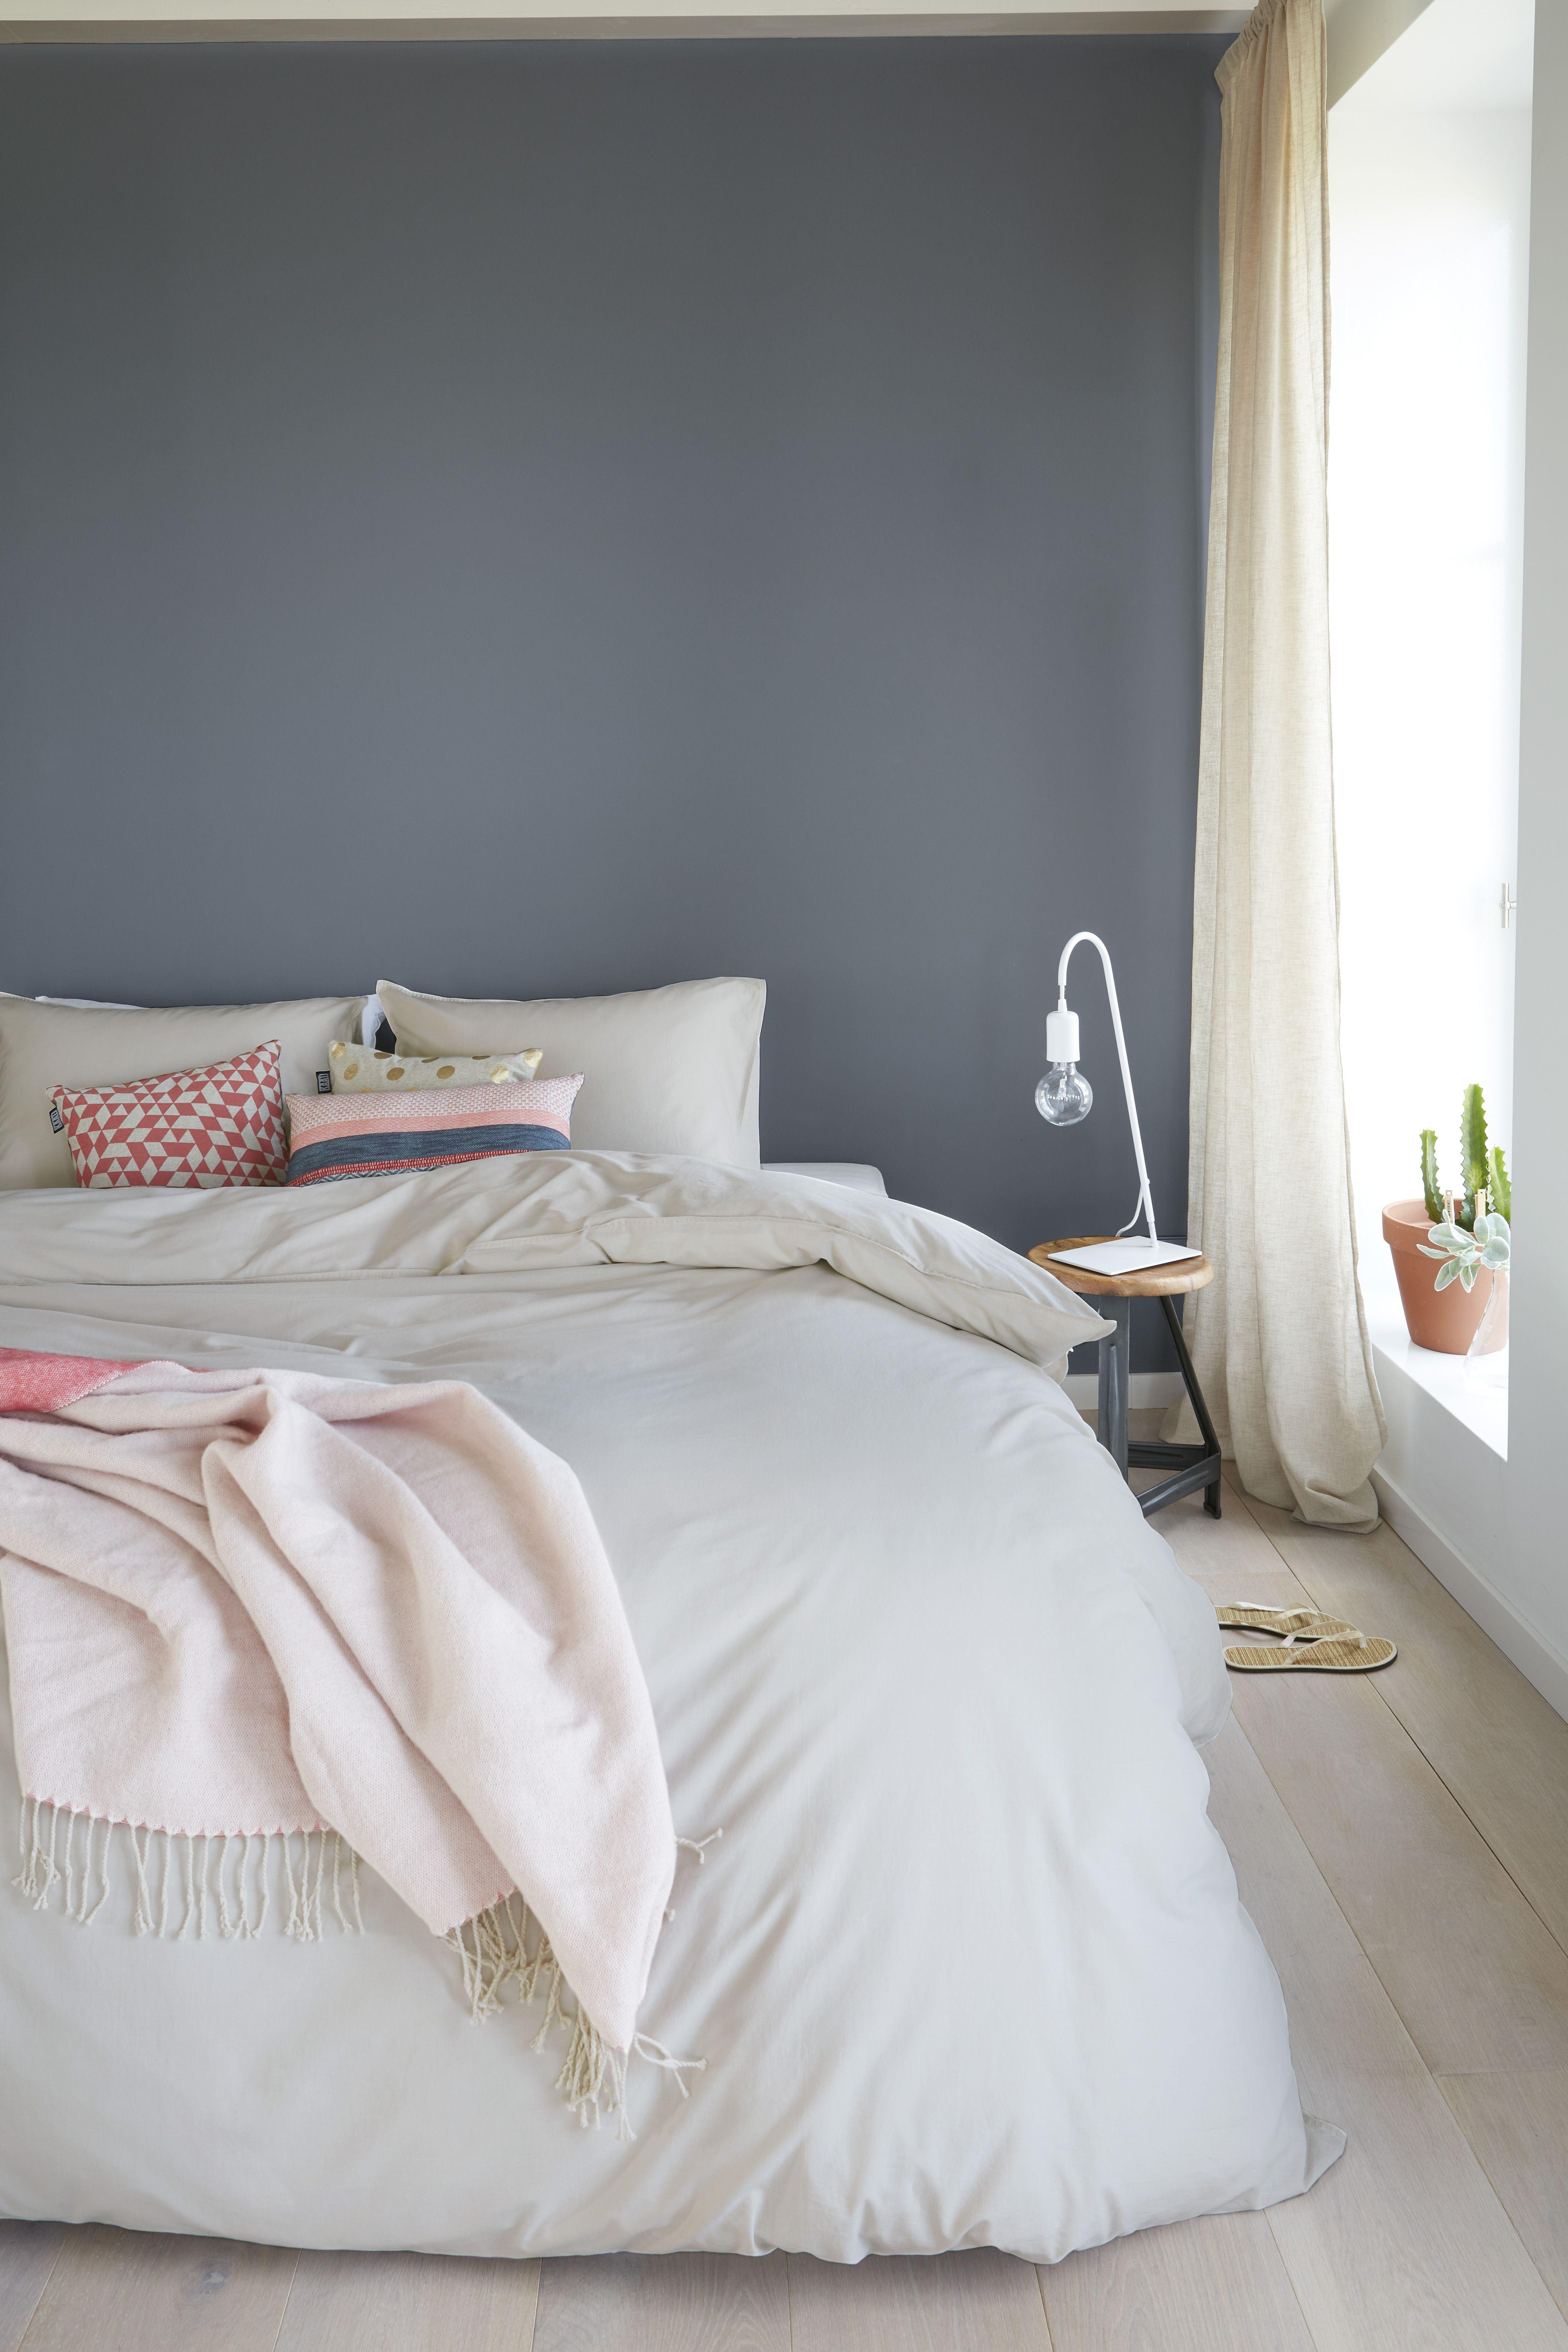 Beddinghouse Basic 240 x 220 cm | Pinterest | Schlafzimmer ideen ...